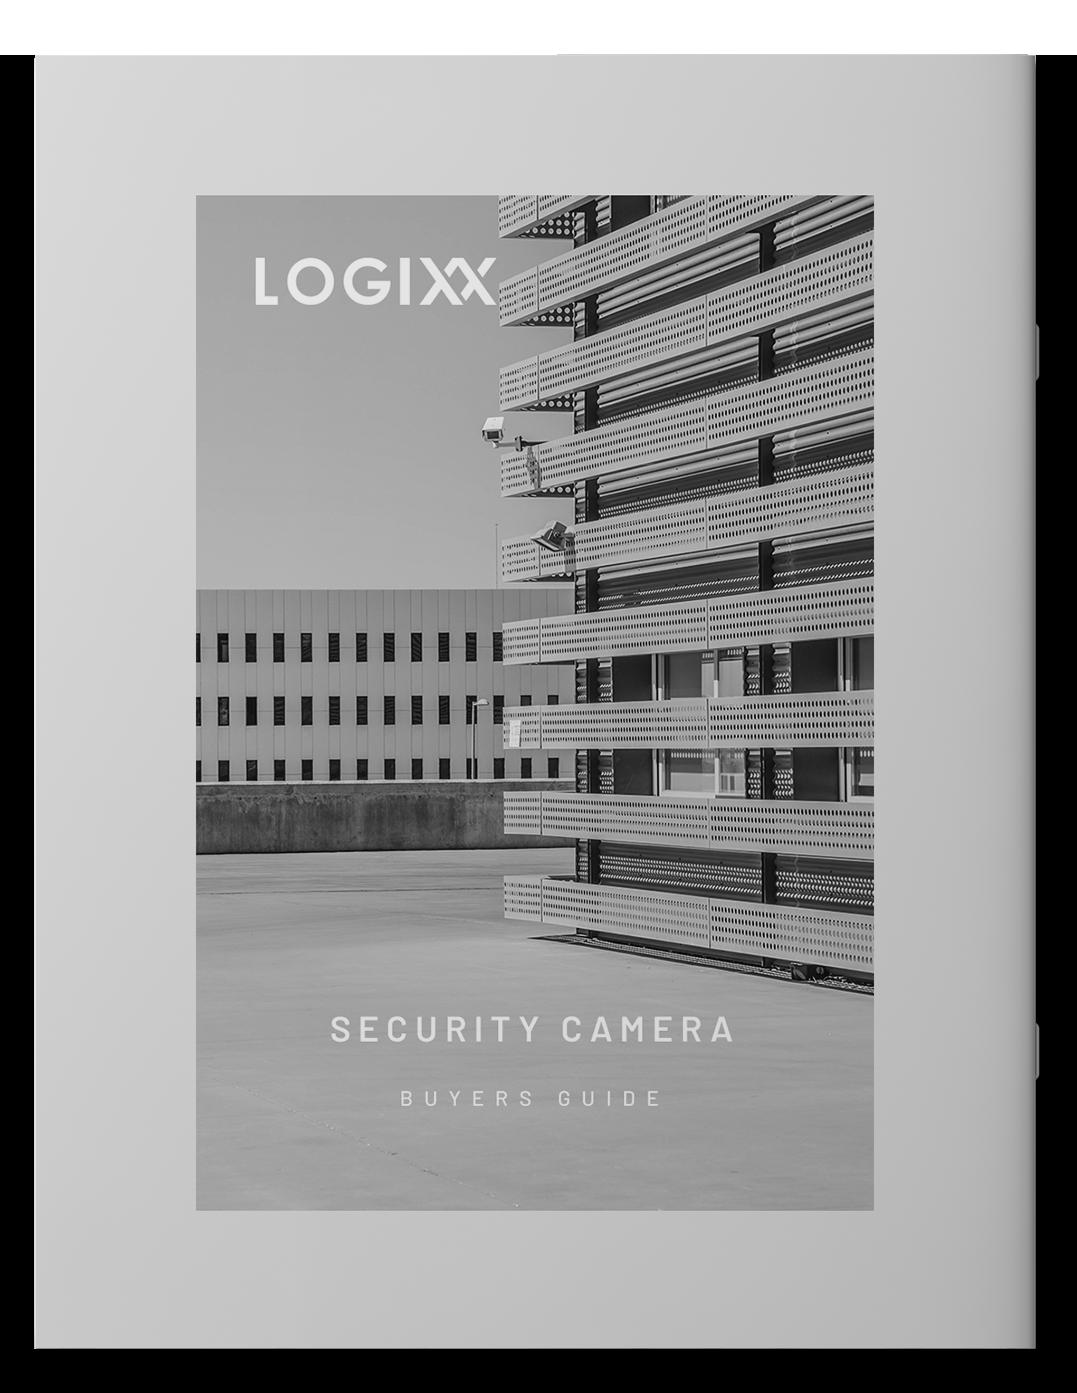 Security Camera Buyers Guide, Logixx Security